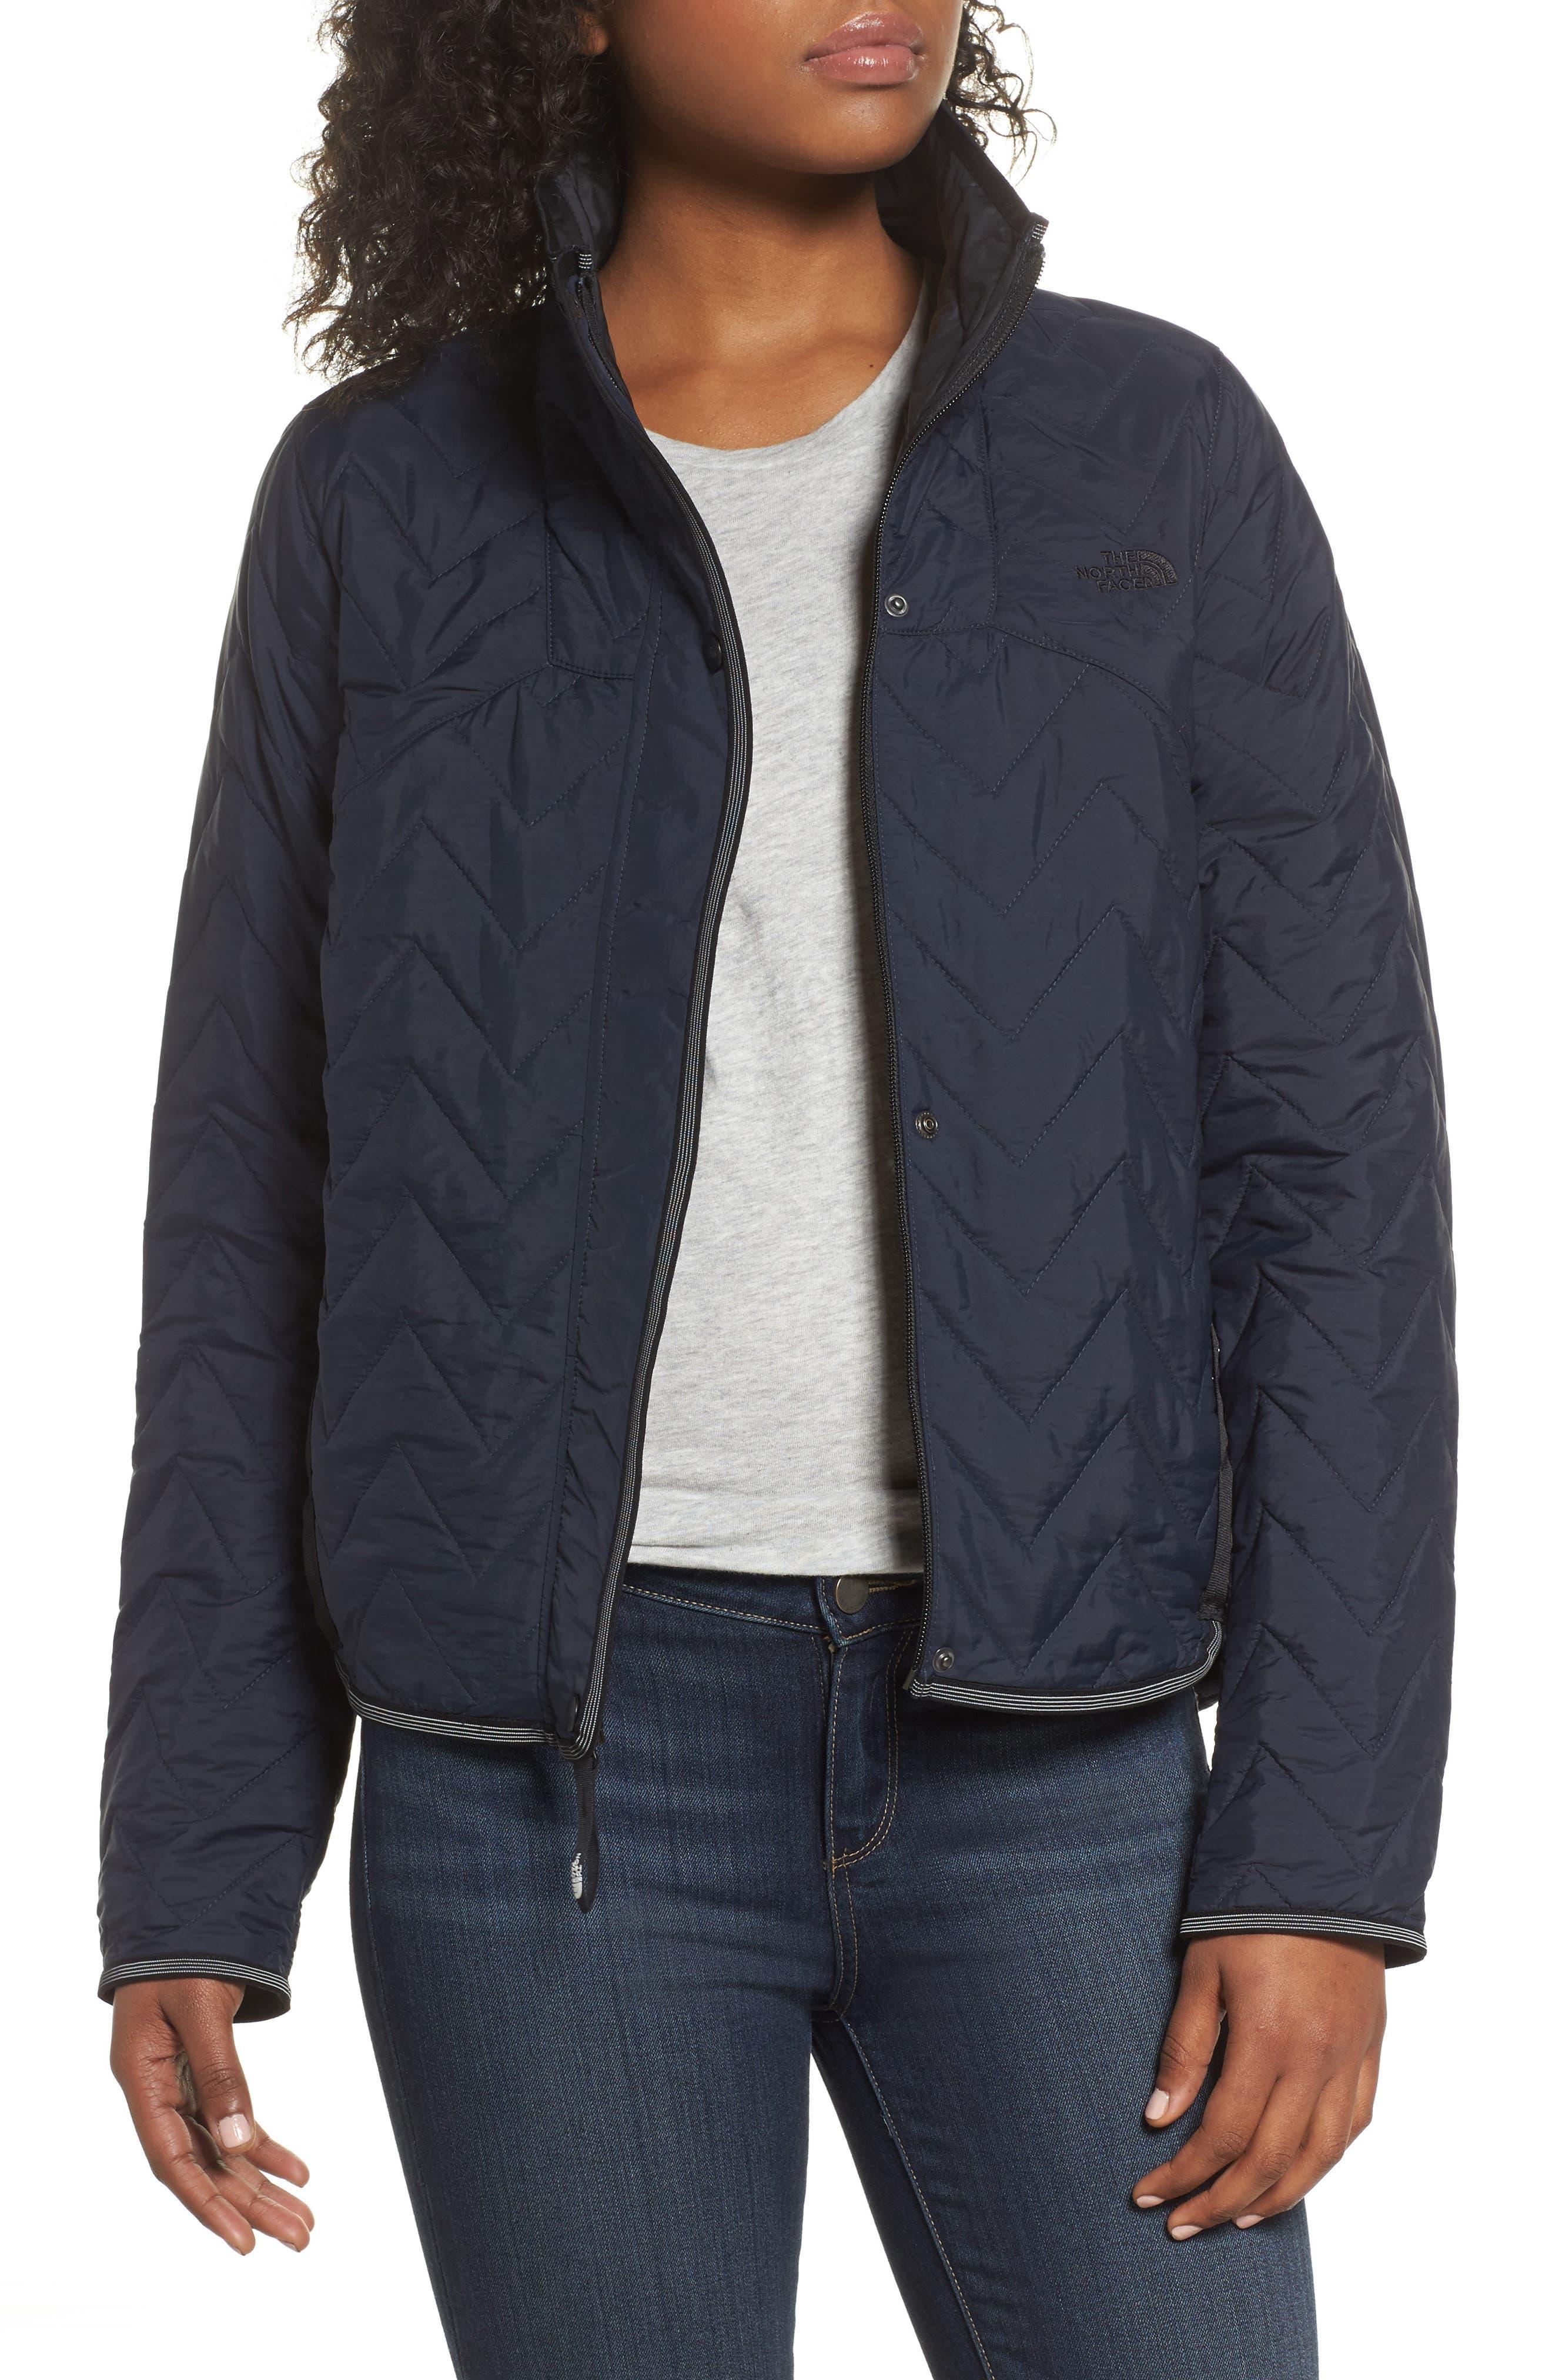 Westborough Insulated Jacket,                             Main thumbnail 1, color,                             Urban Navy